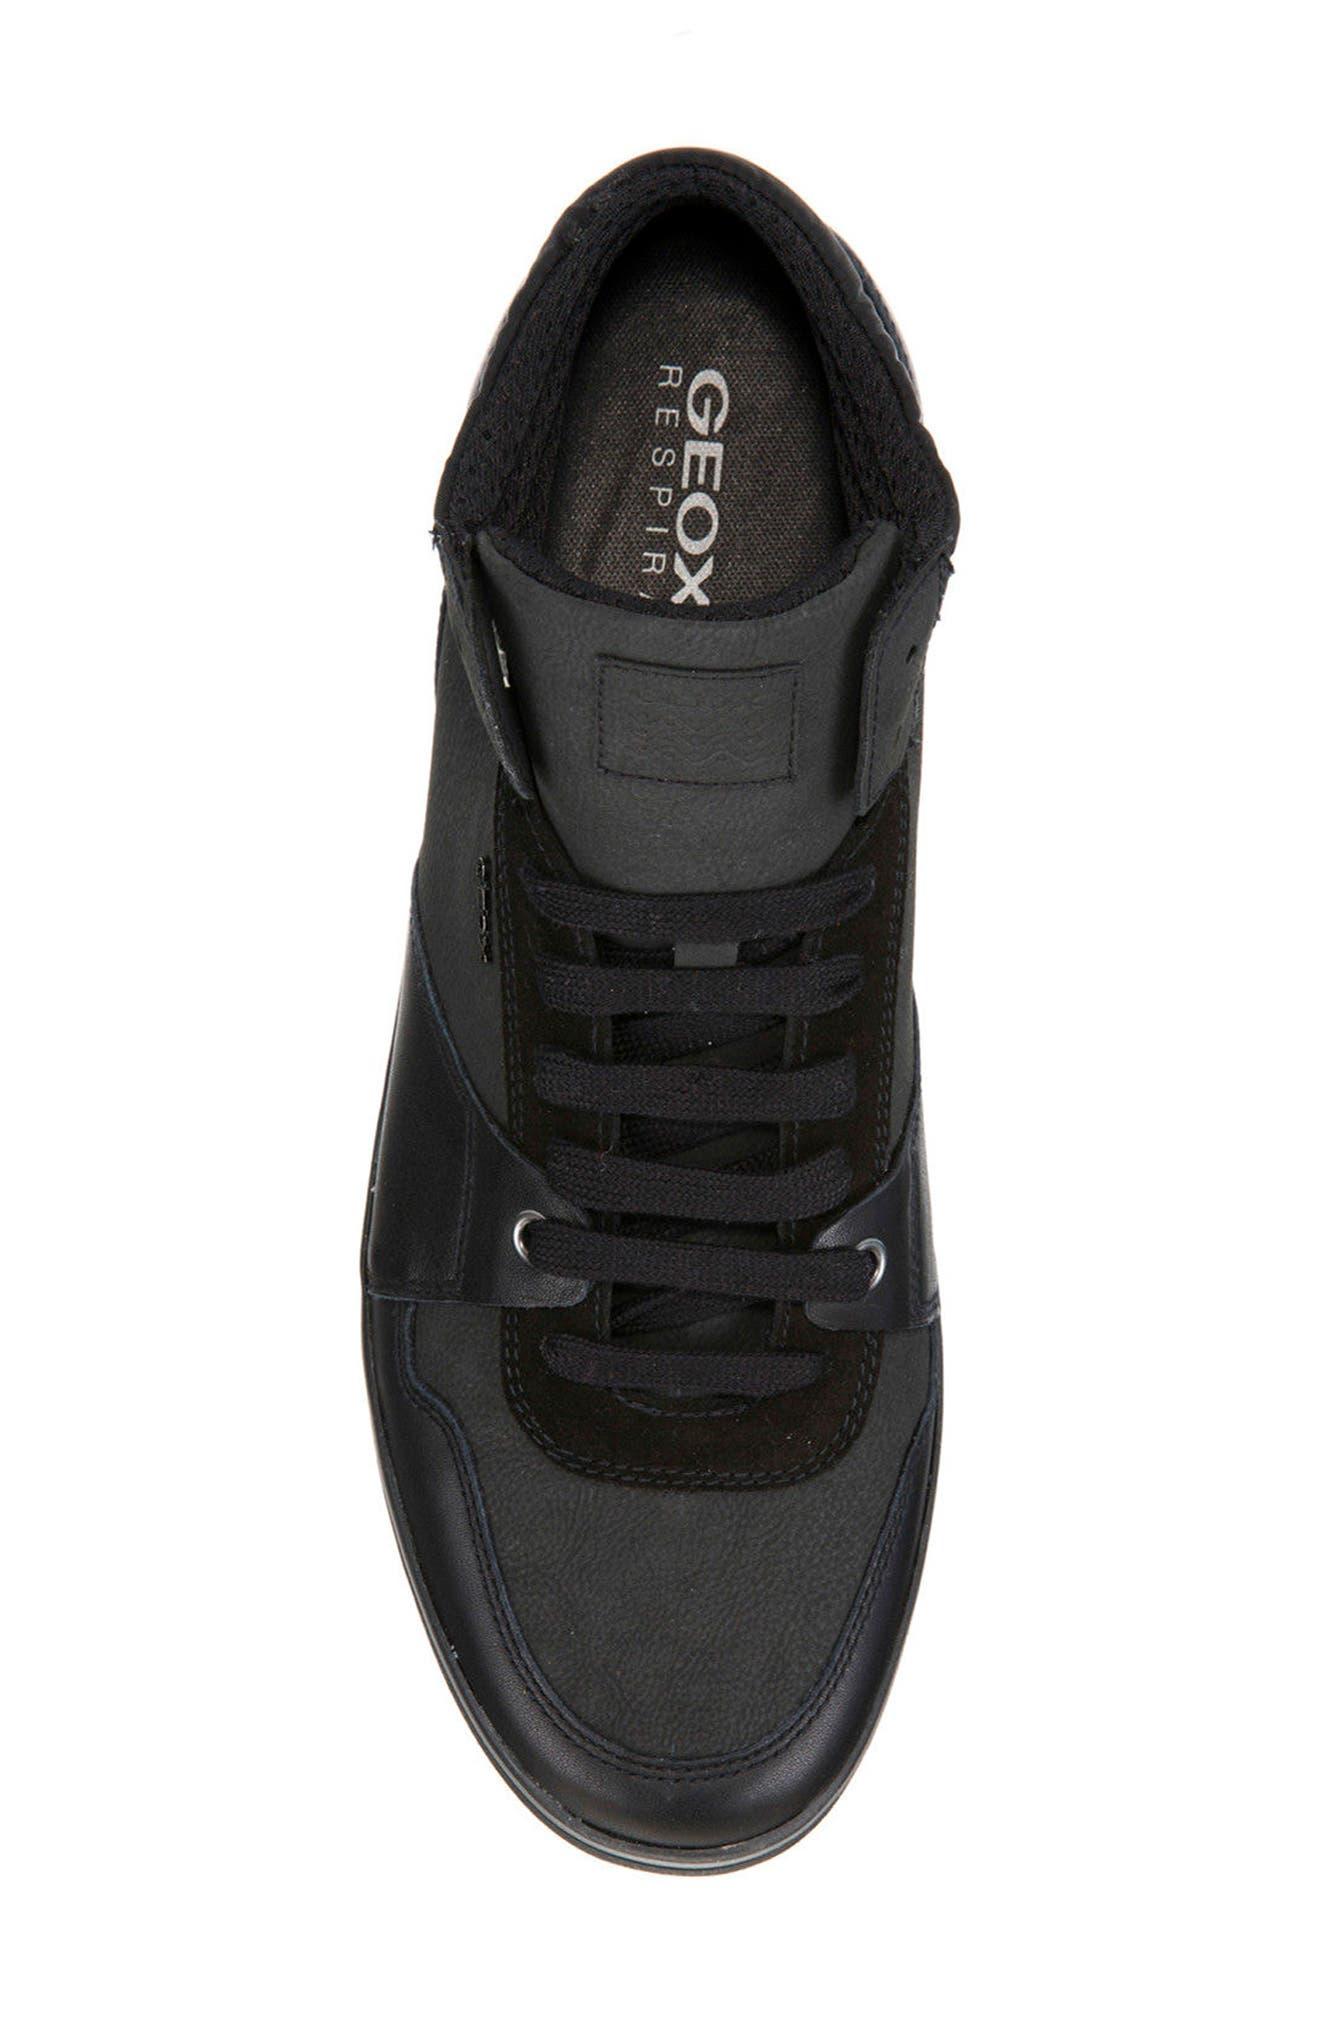 Box 31 High Top Sneaker,                             Alternate thumbnail 5, color,                             Black